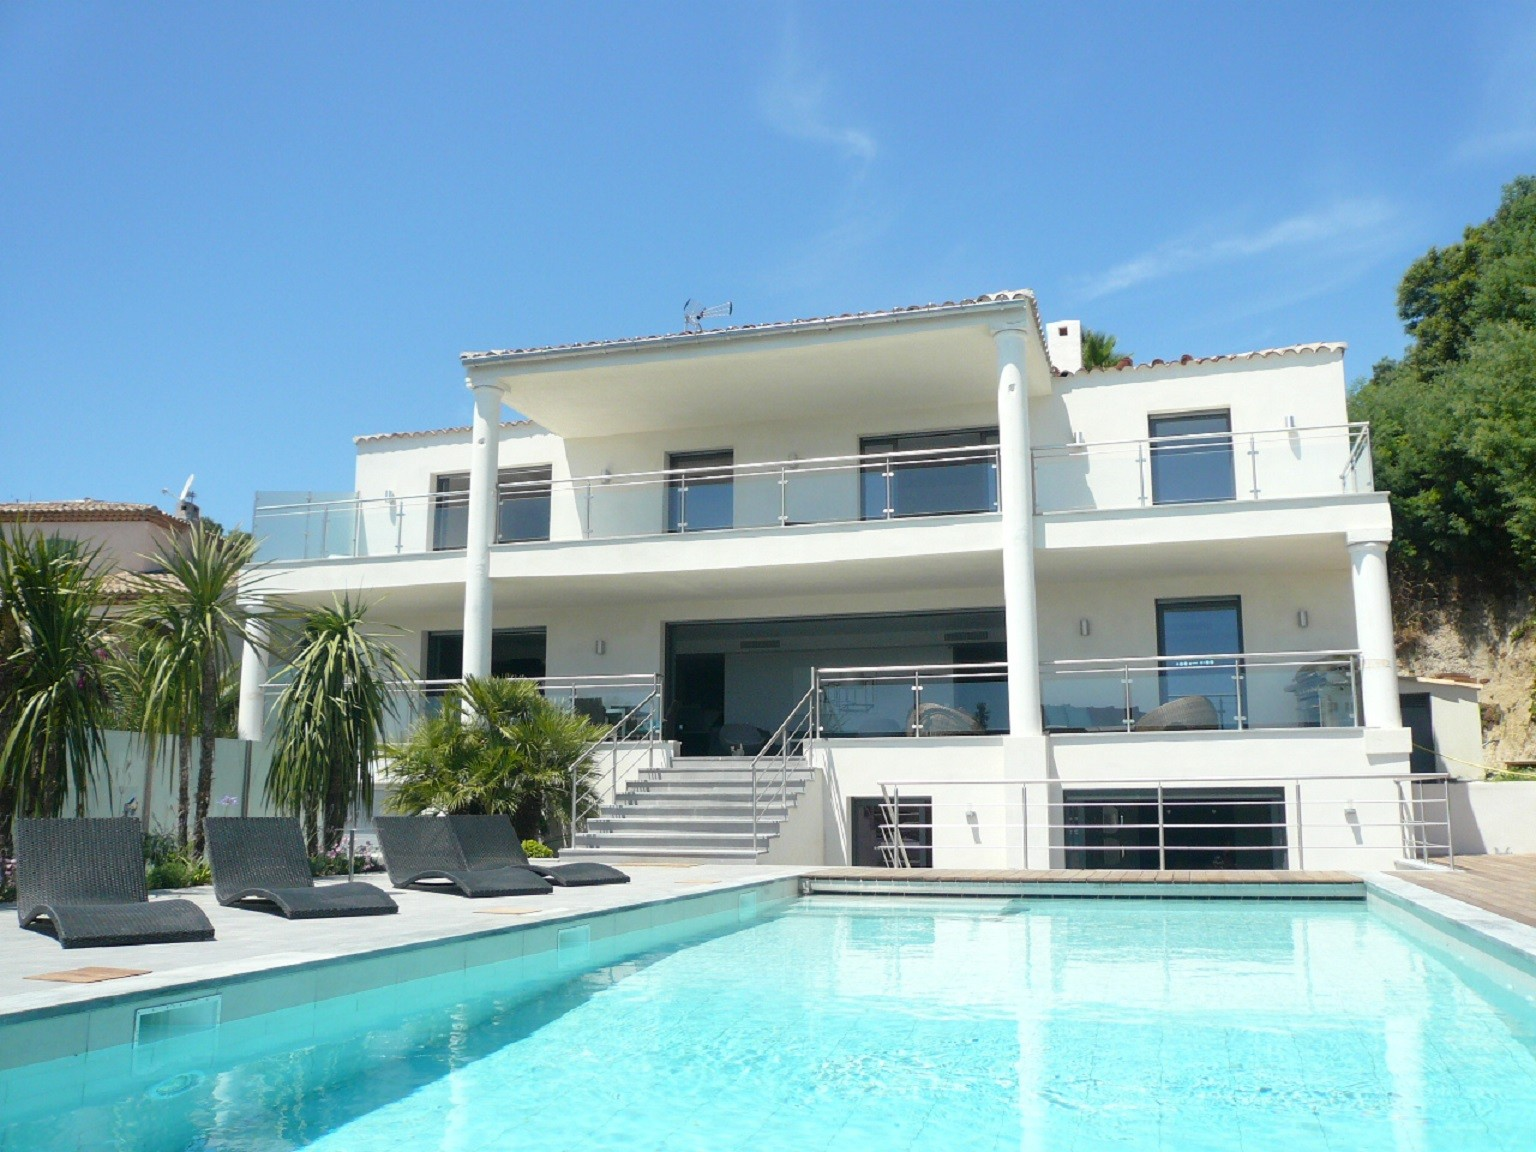 Belle villa avec piscine antibes - Location villa hammamet avec piscine ...